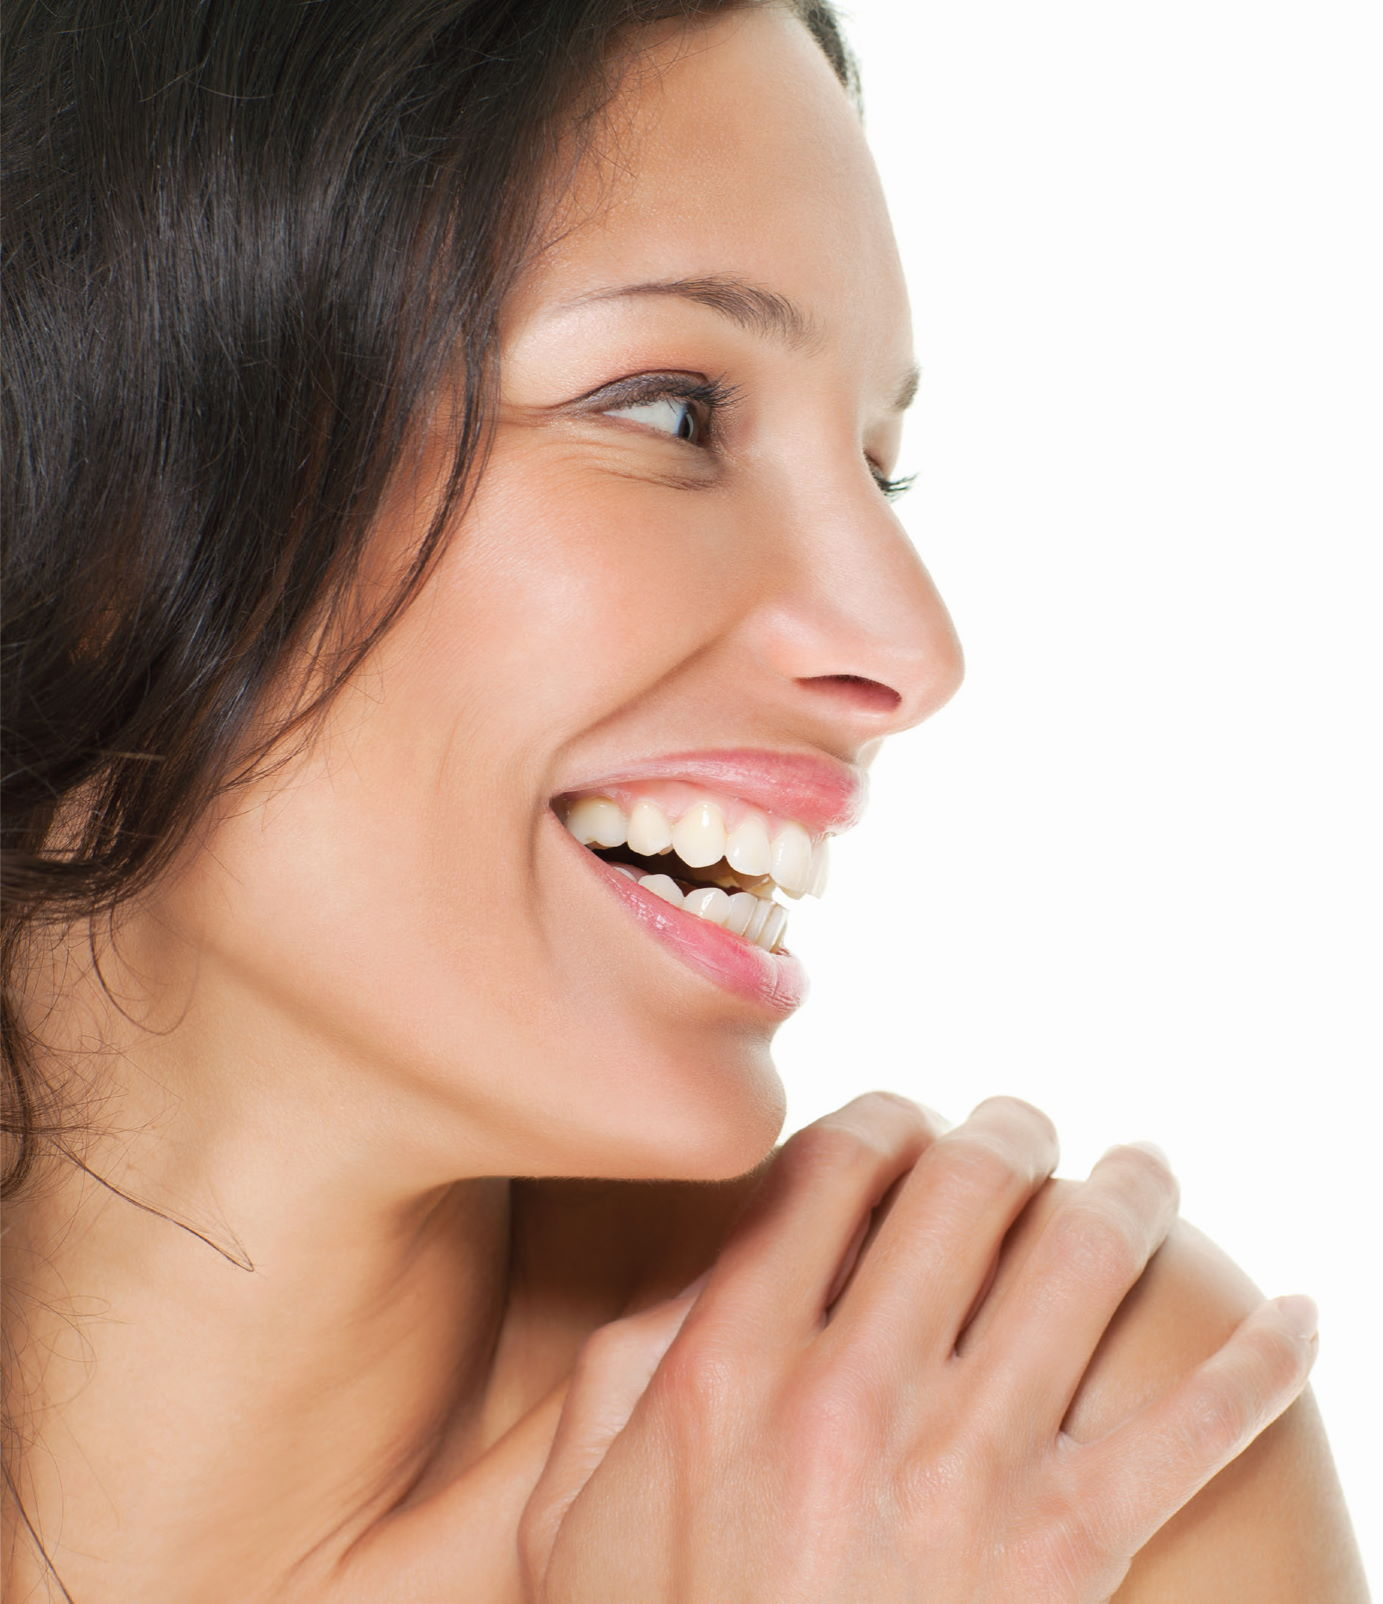 Ästhetische kosmetische Behandlungen